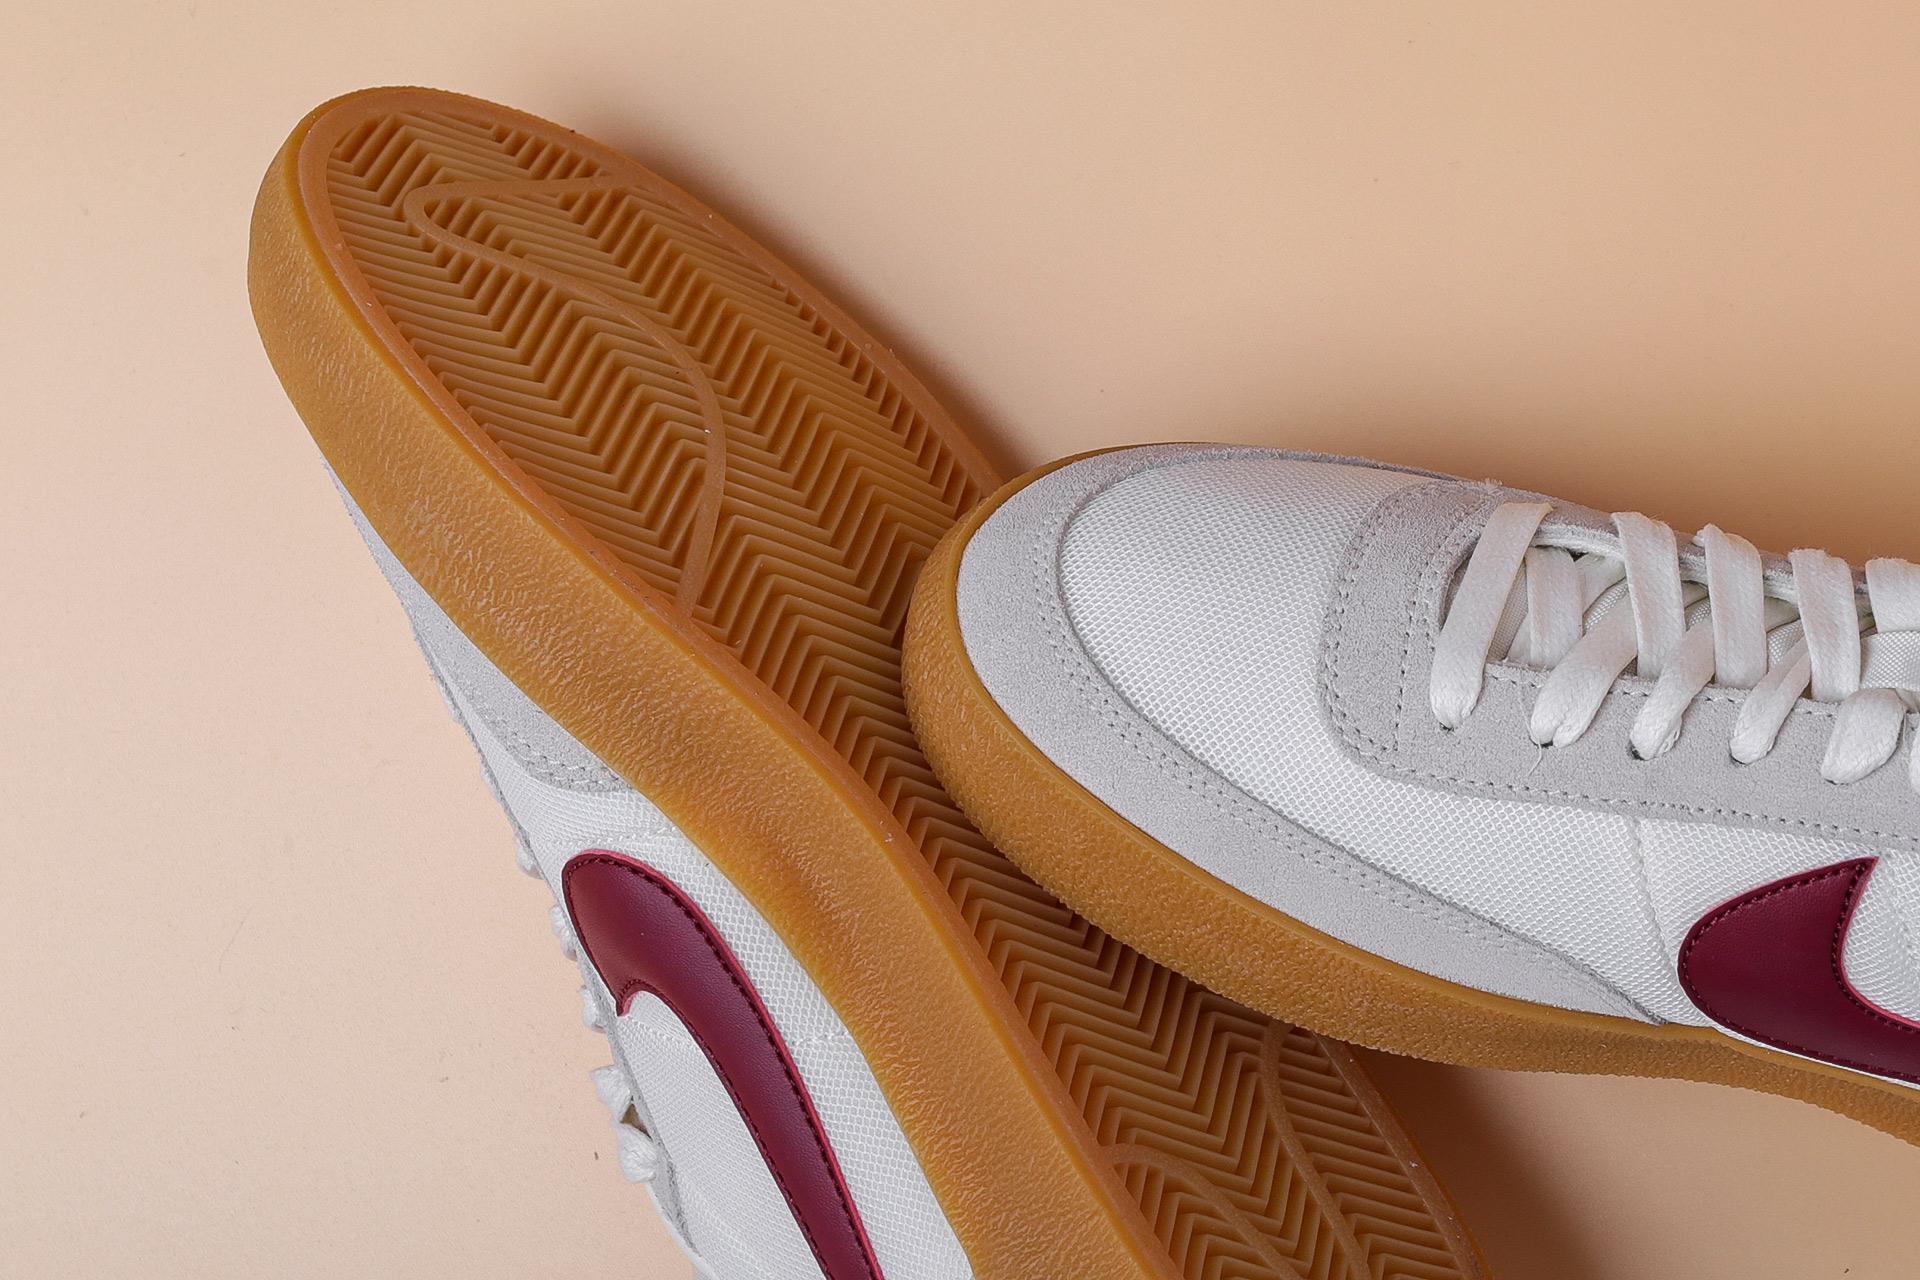 34d3b88d64d ... Купить мужские бежевые кроссовки Nike Killshot Vulc - фото 3 картинки  ...